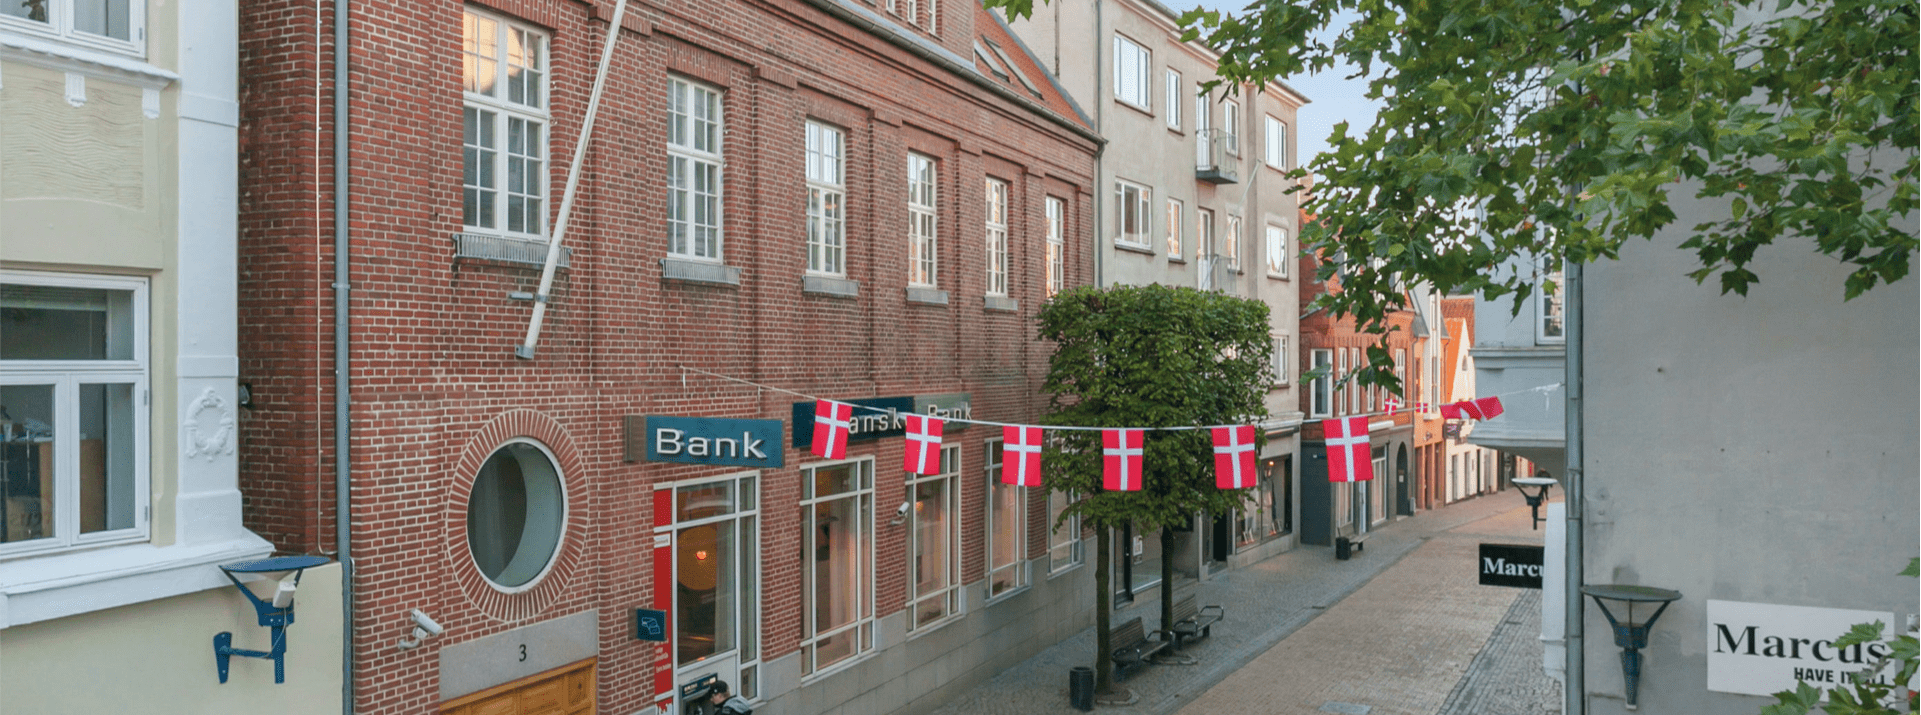 Danish Bank